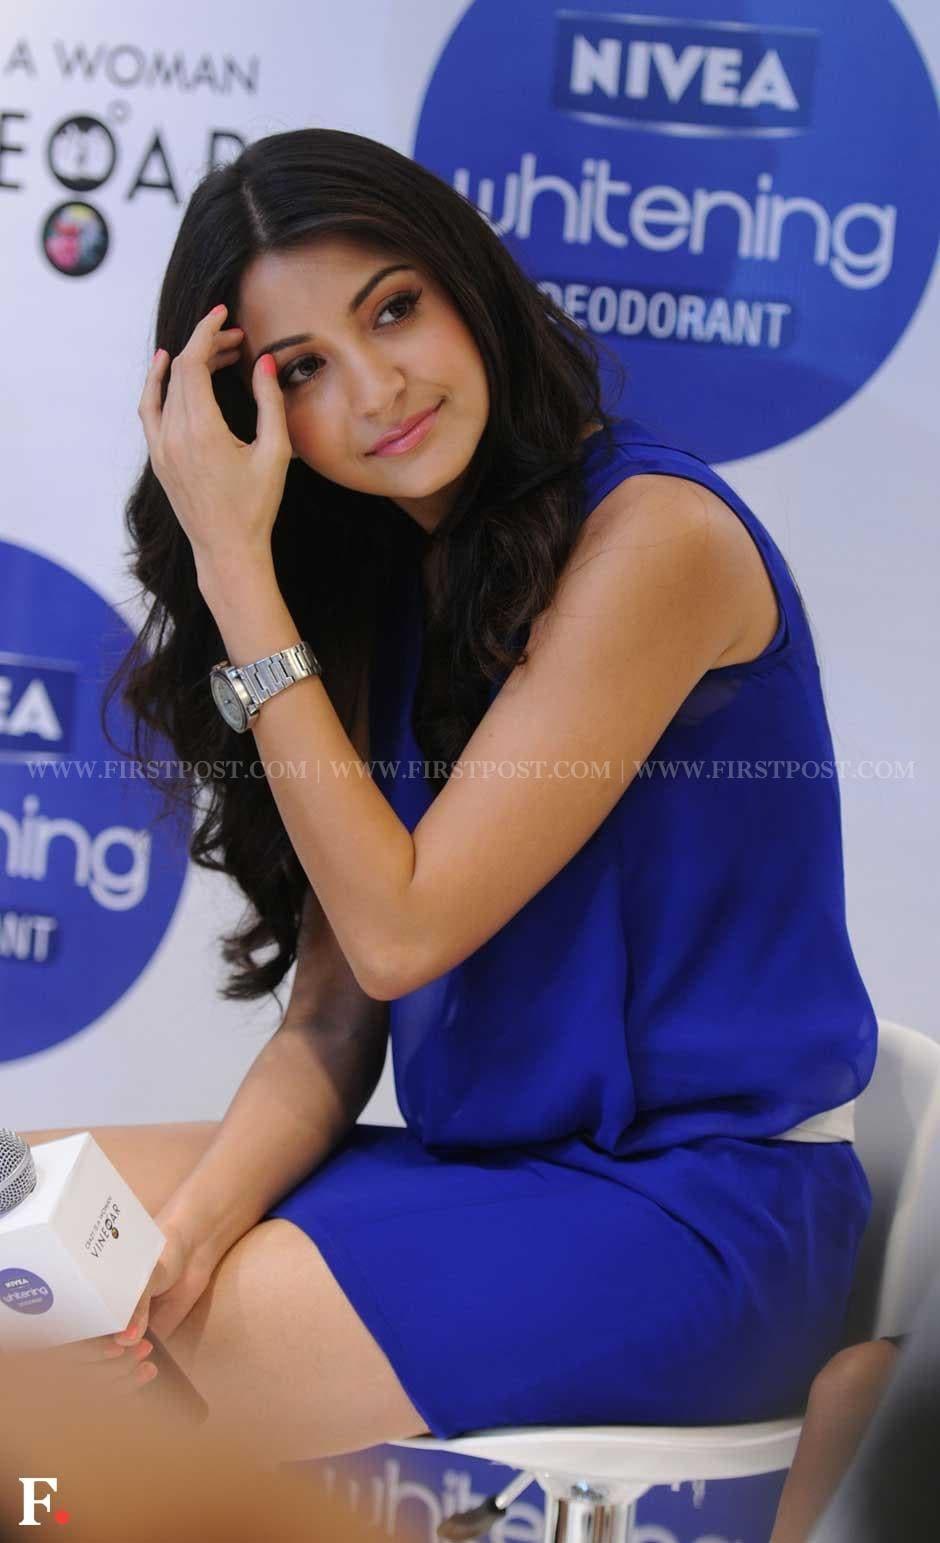 Anushka Sharma endorses Nivea whitening Deodorant. Sachin Gokhale/Firstpost